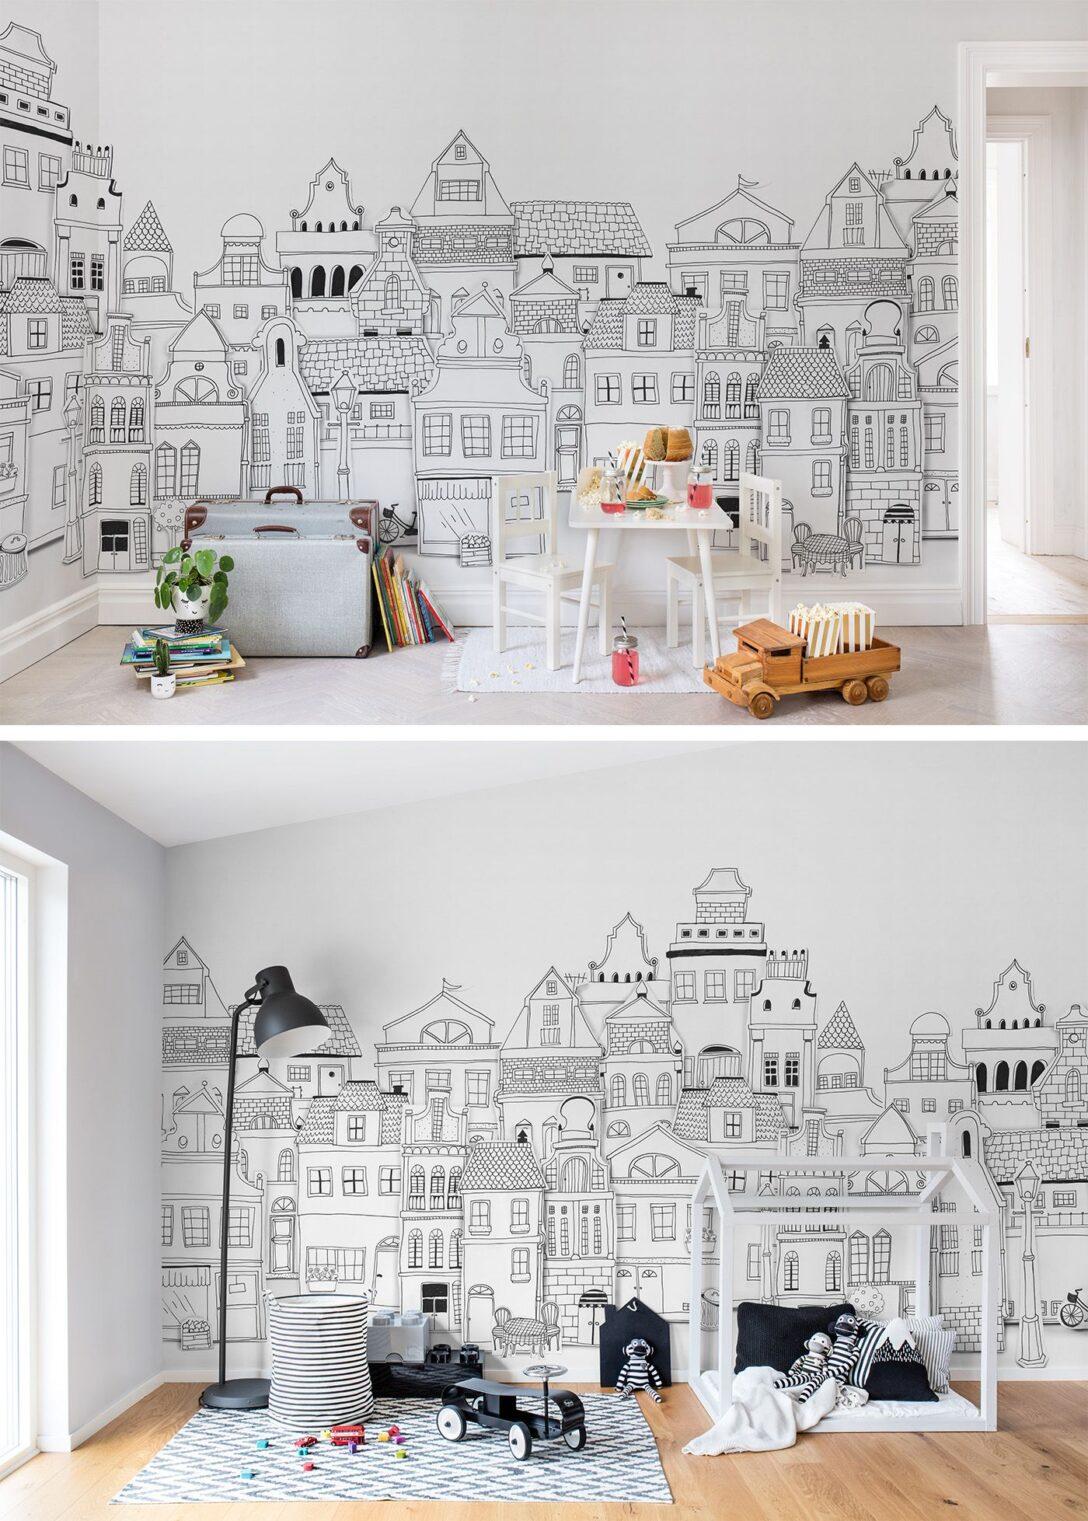 Large Size of Kinderzimmer Wanddeko London Houses Tapete Küche Sofa Regal Regale Weiß Kinderzimmer Kinderzimmer Wanddeko